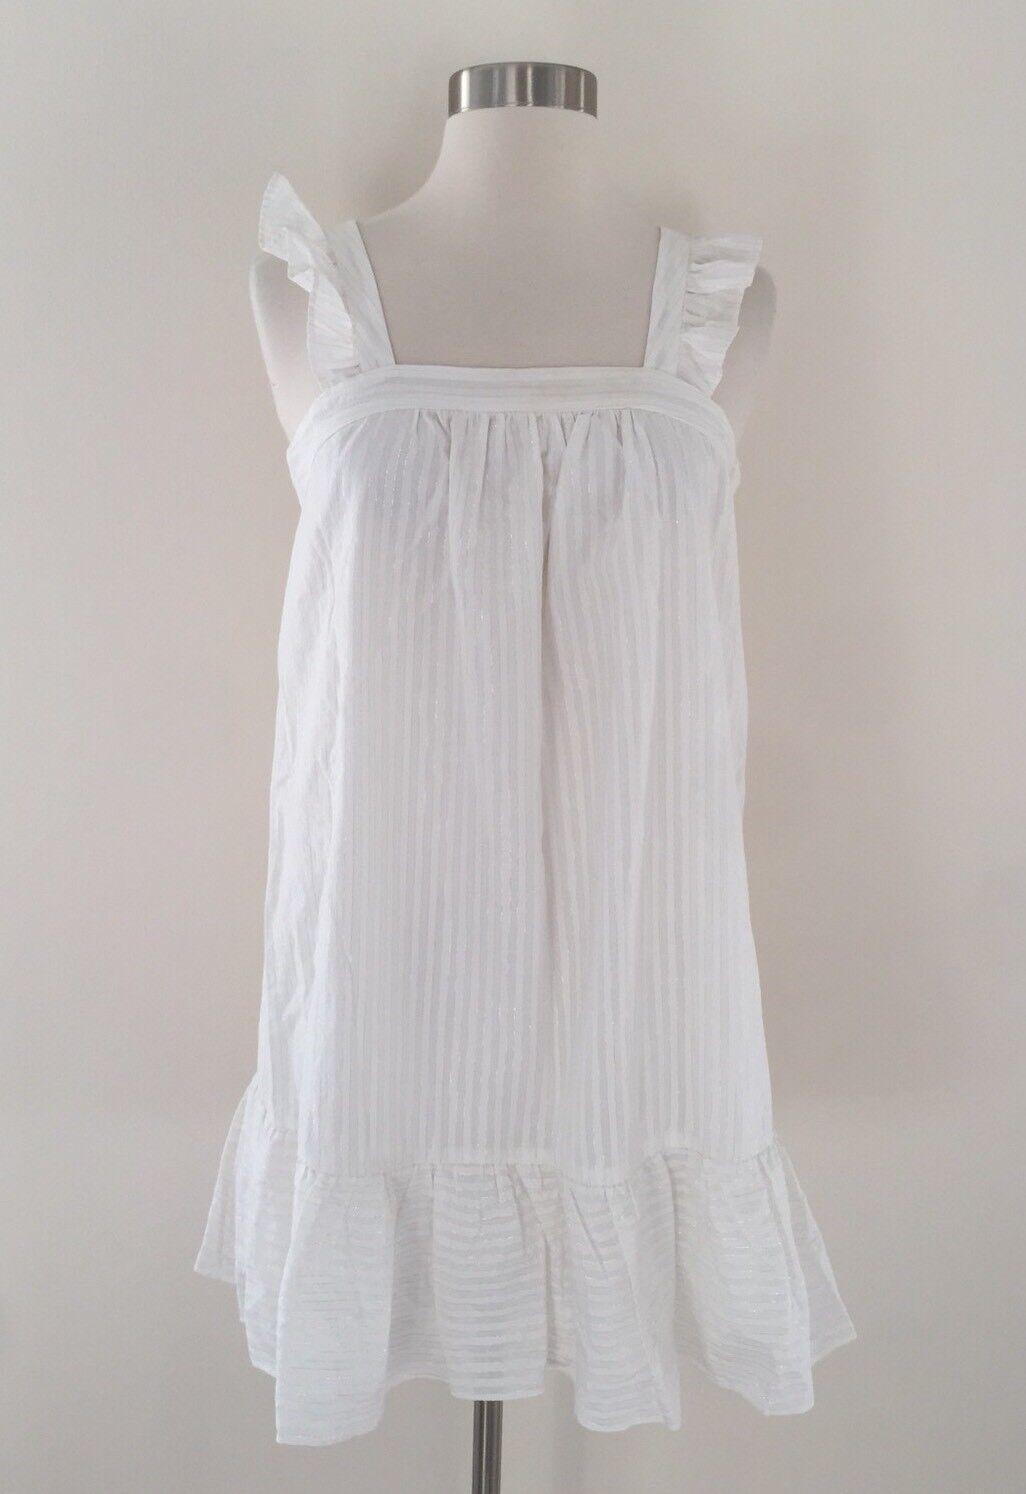 New Madewell Metallic Stripe Ruffle Dress Sz XS Lighthouse Weiß G6078